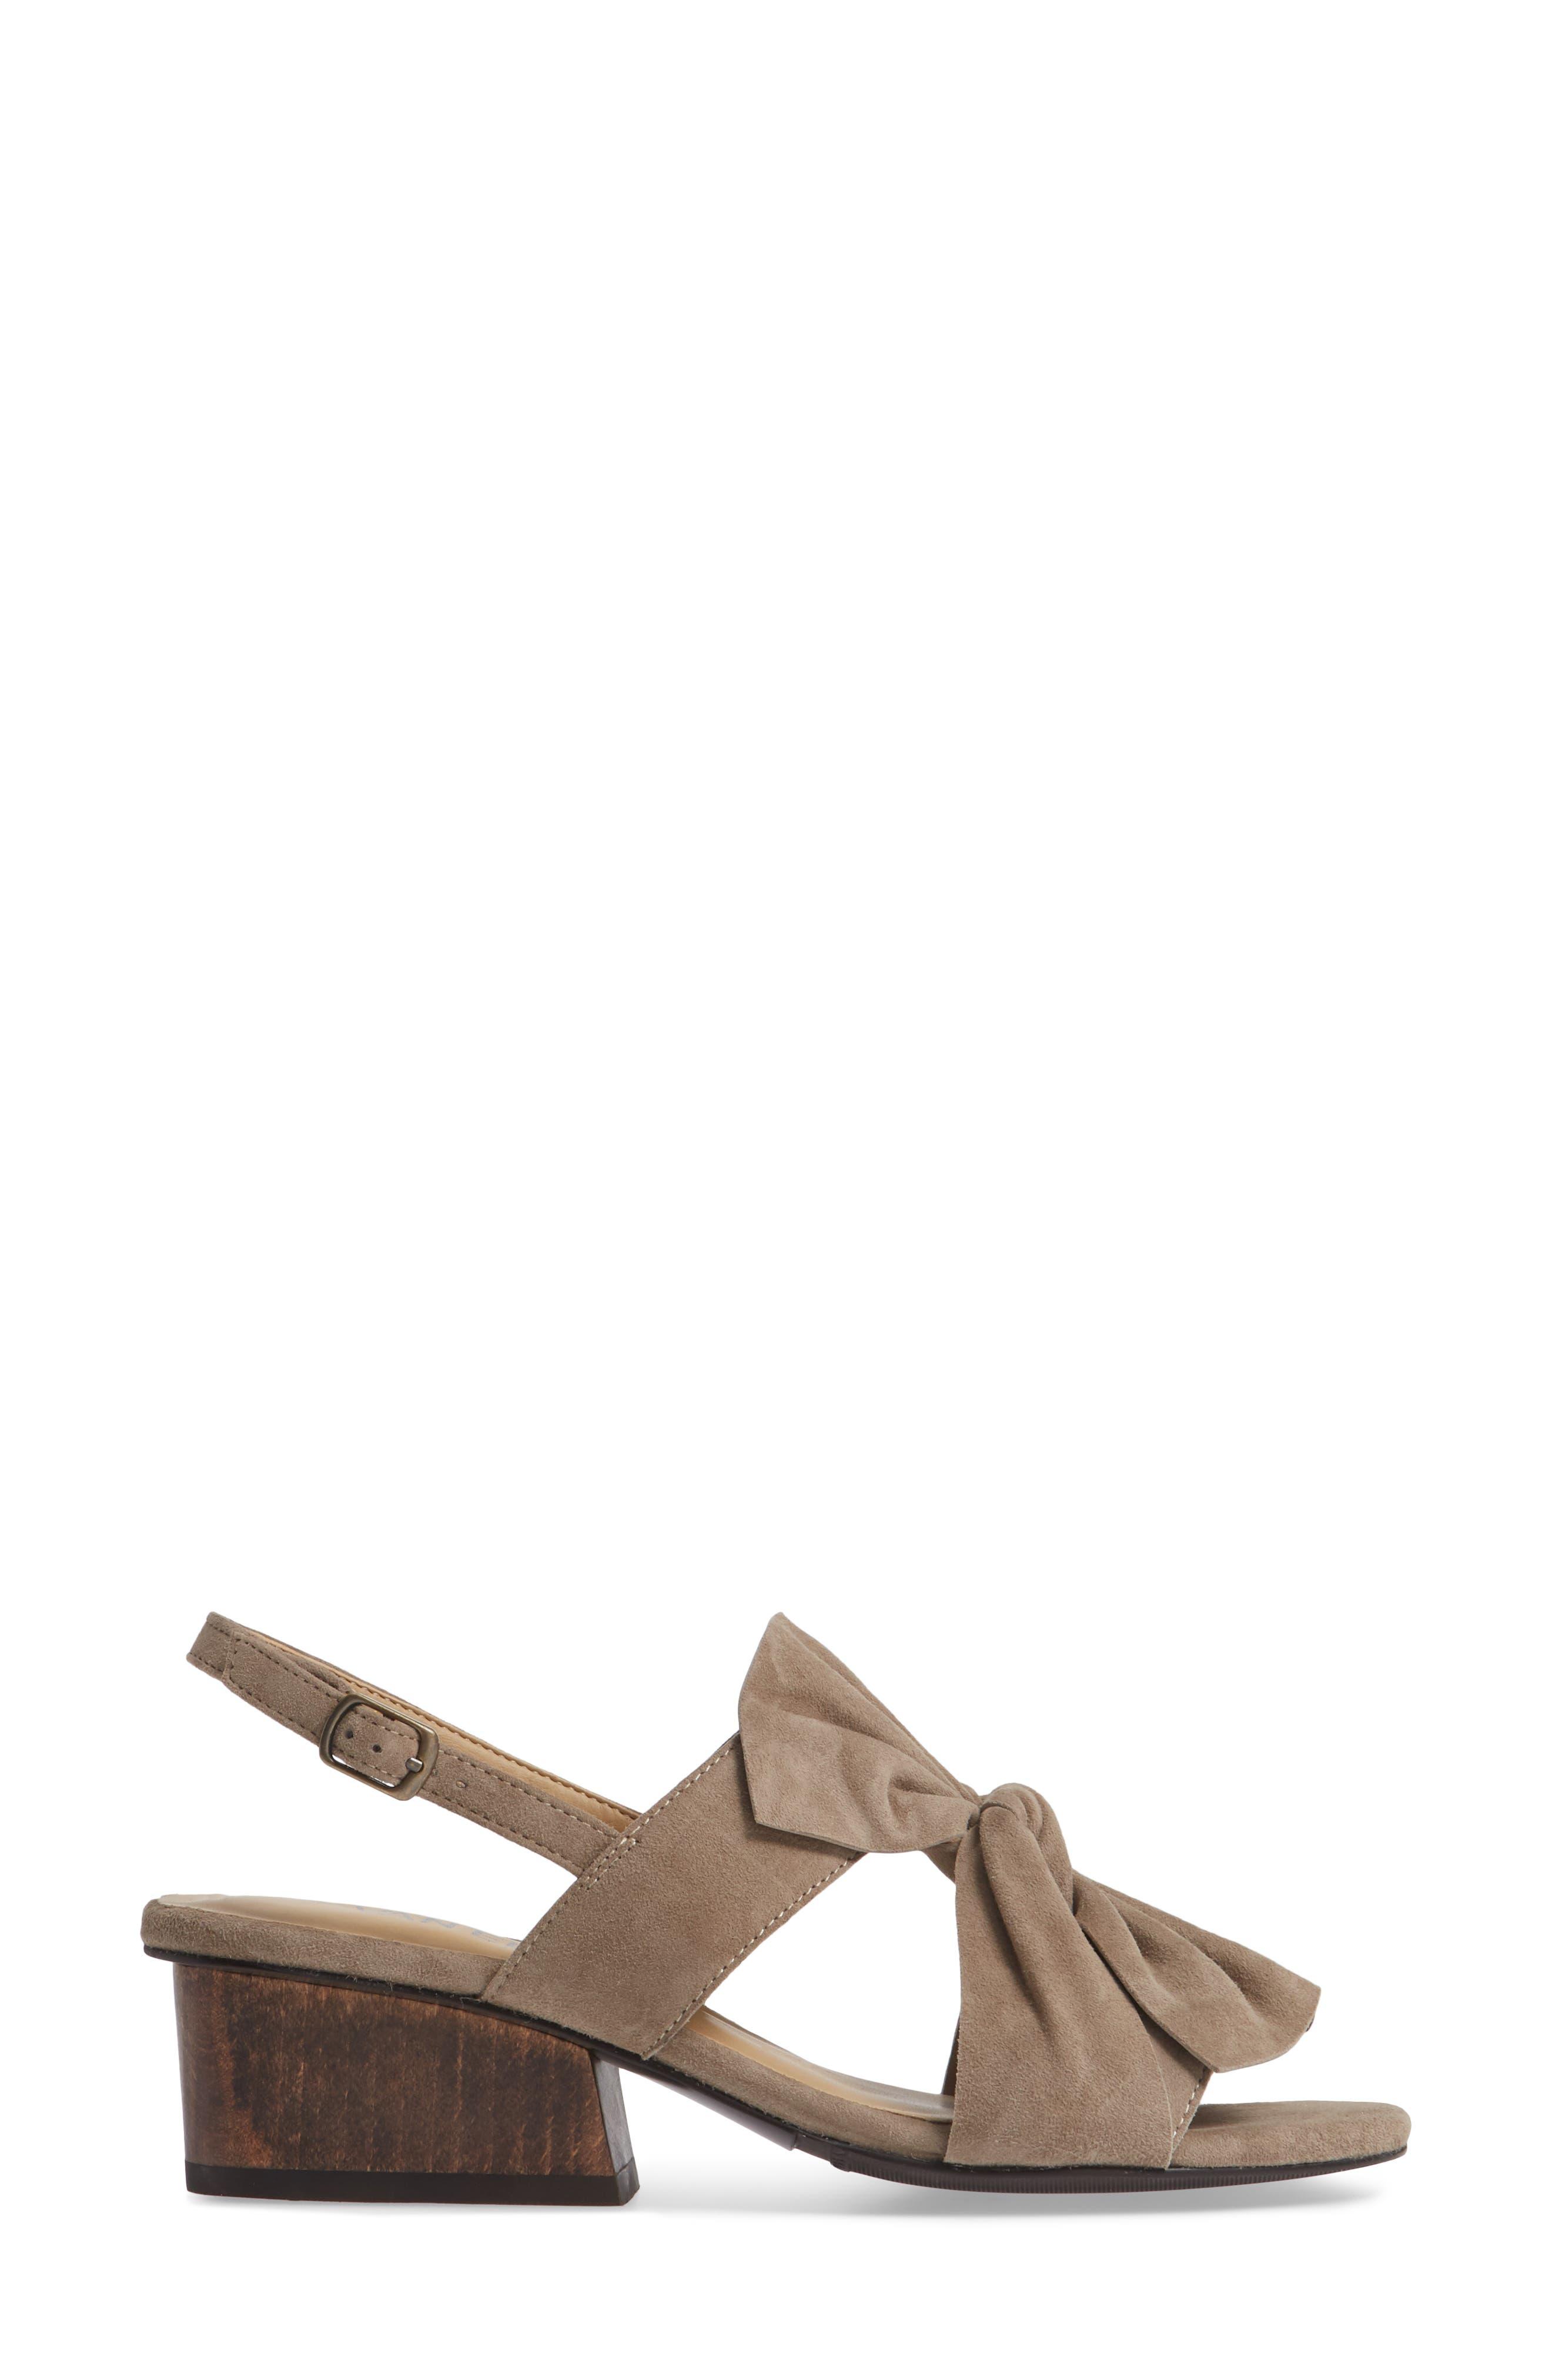 Camey Slingback Sandal,                             Alternate thumbnail 3, color,                             TRUFFLE SUEDE